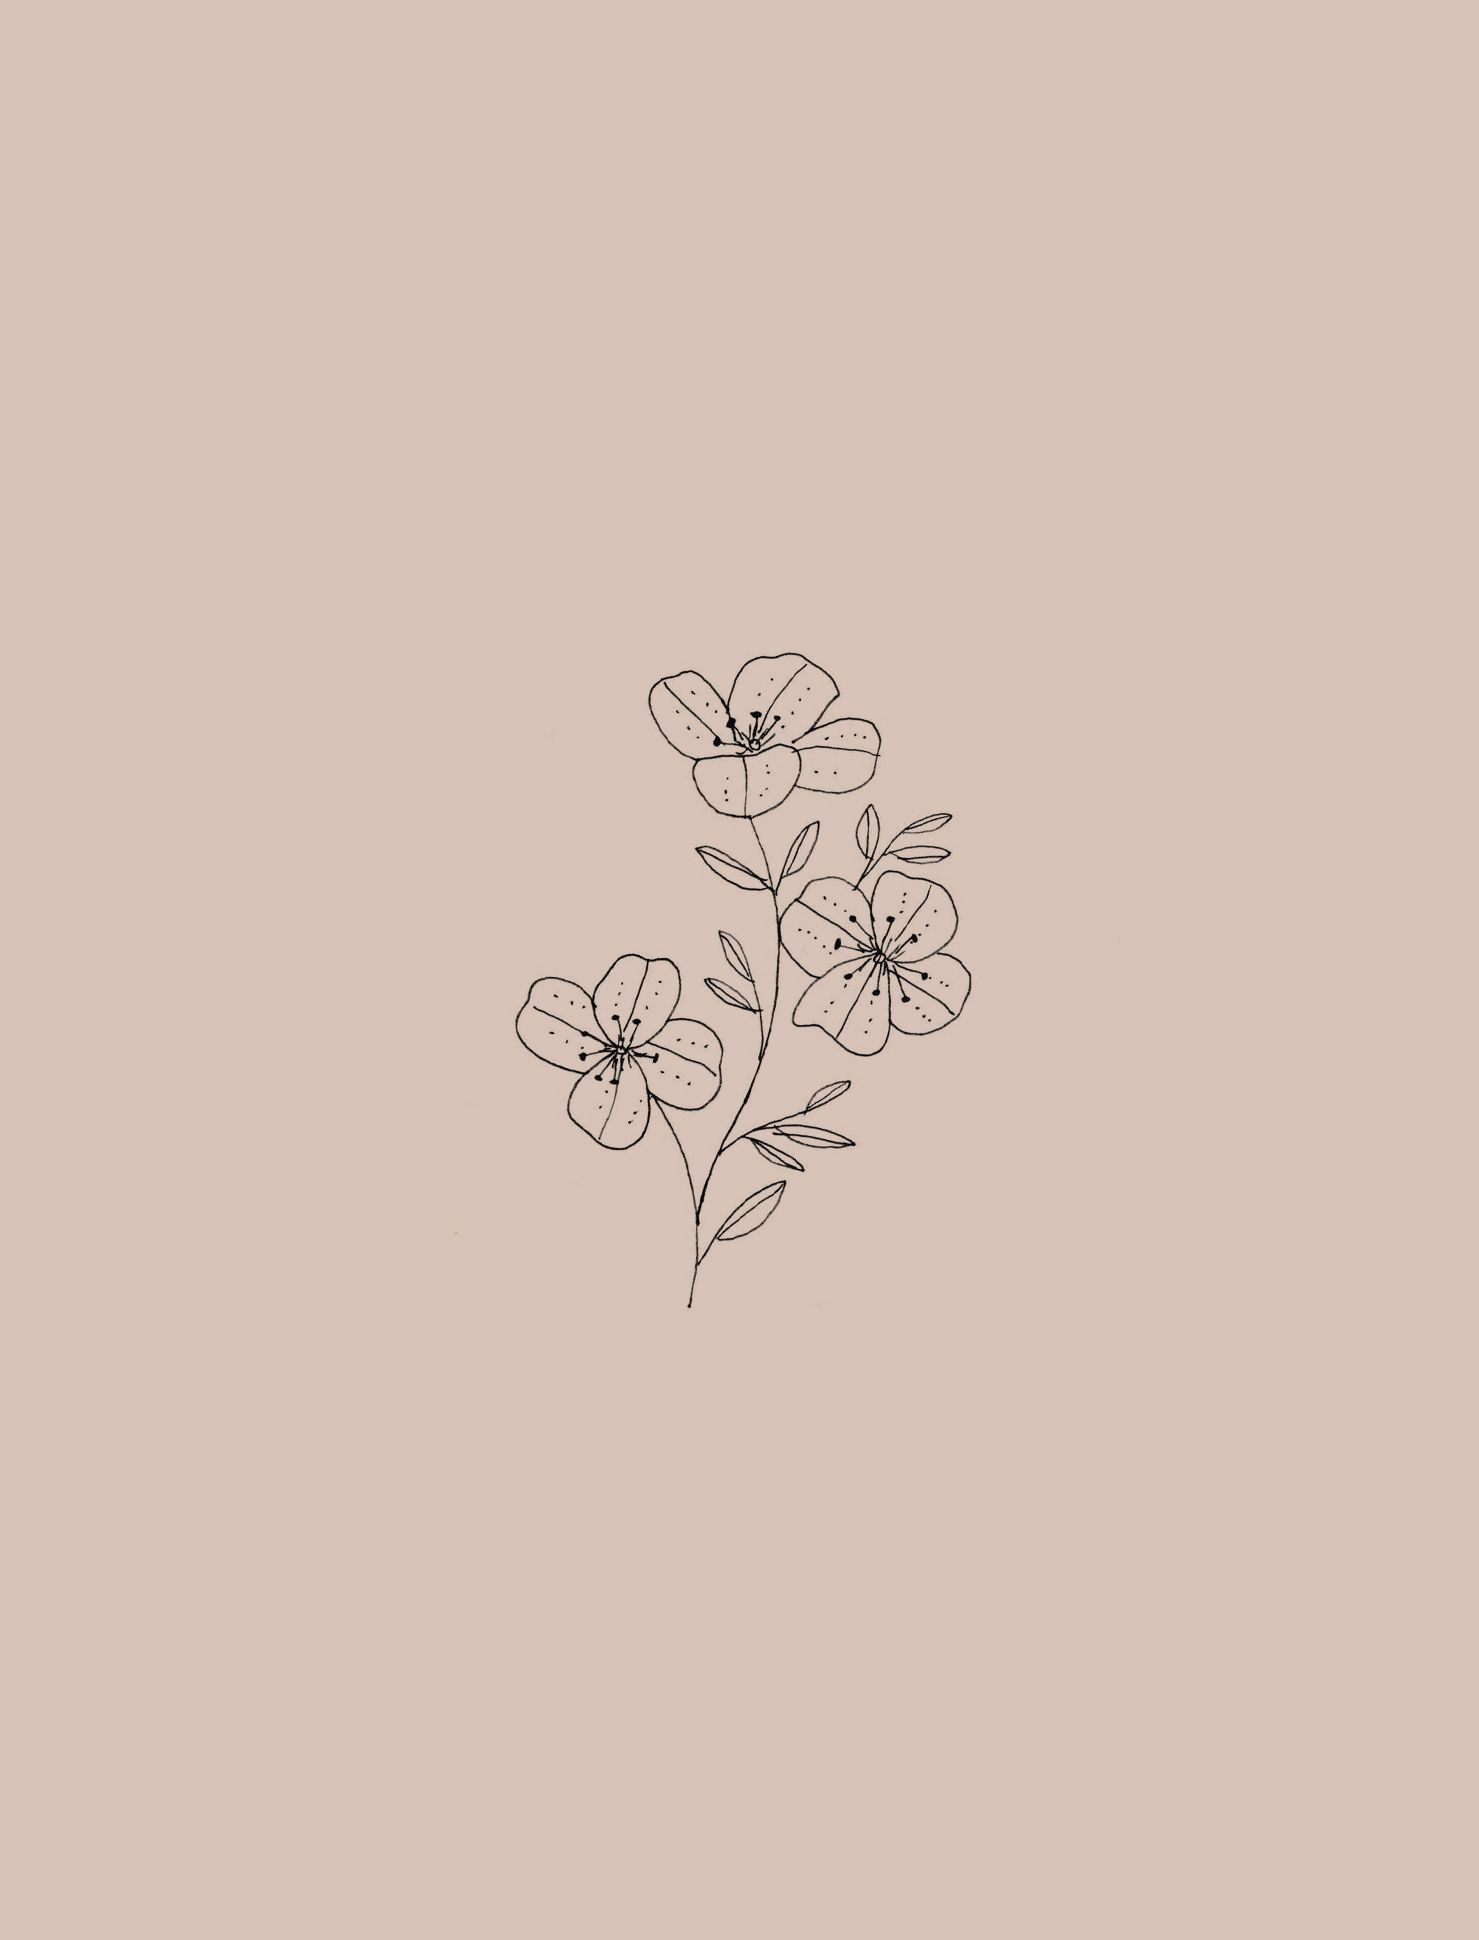 Botanical Illustration By Ryn Frank Www Rynfrank Co Uk